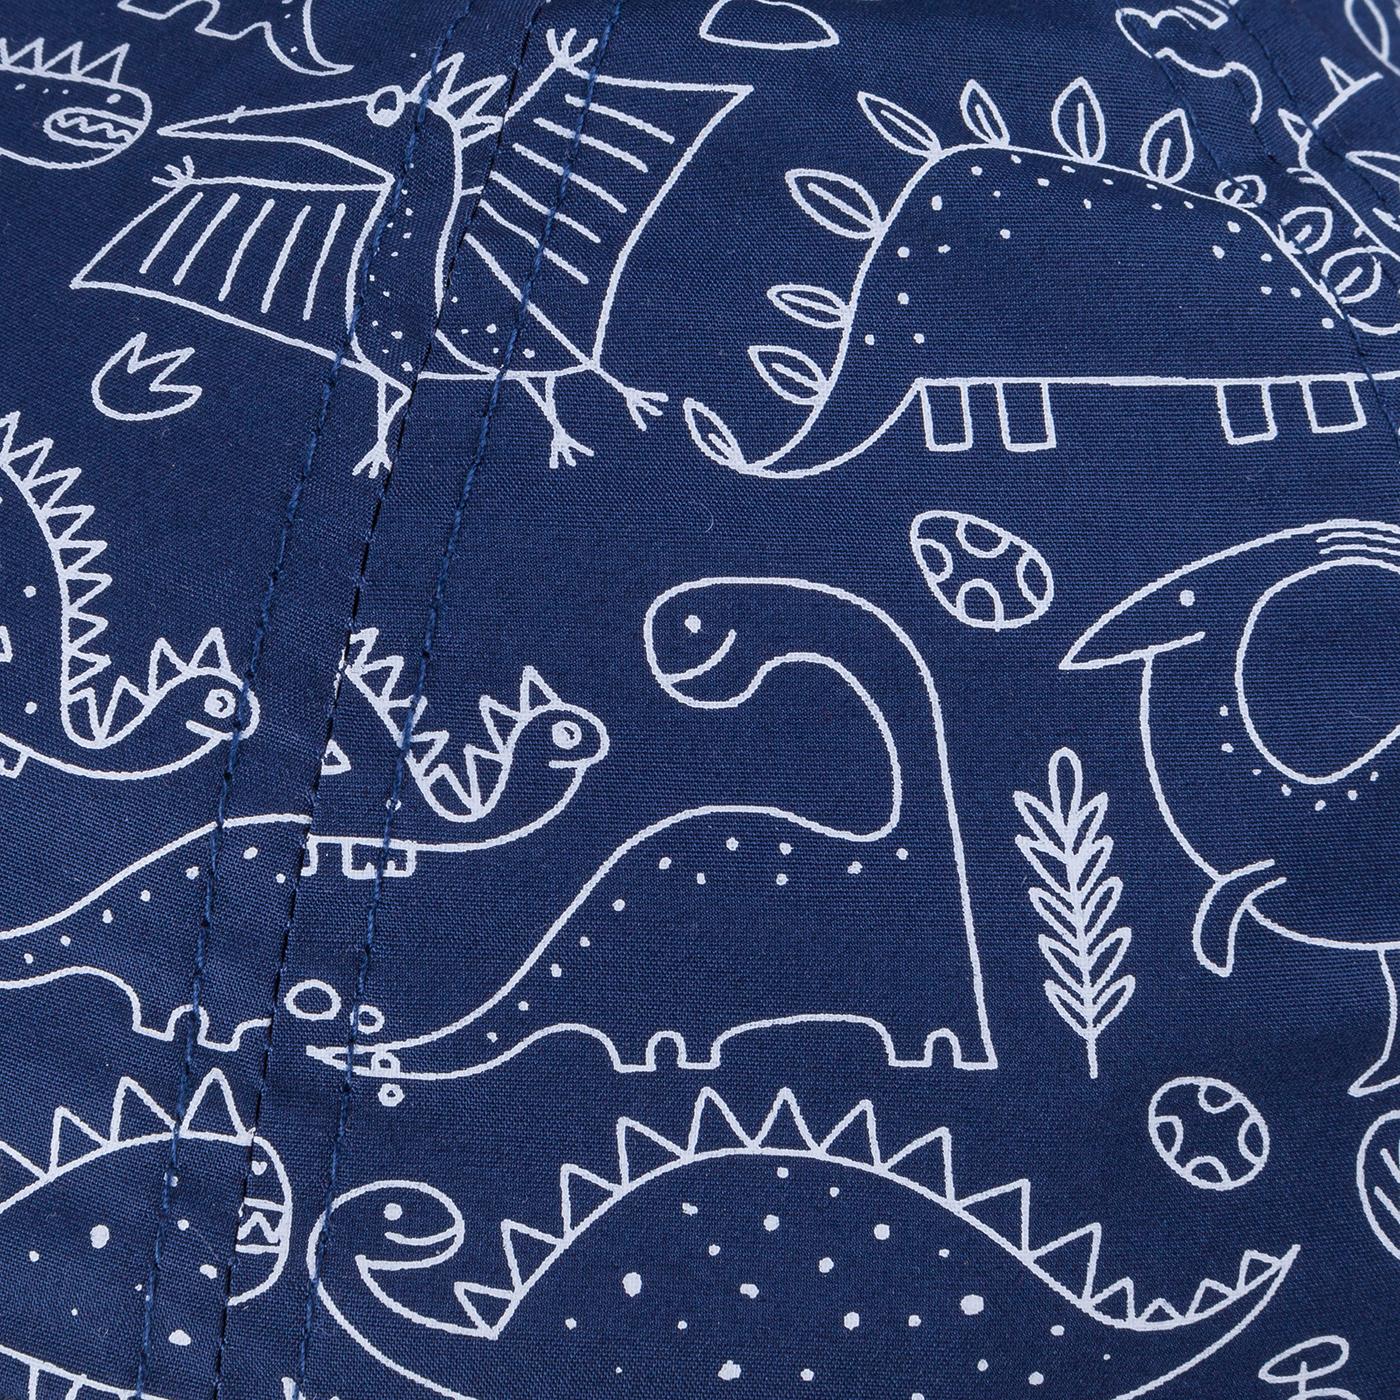 TUTU Kindermütze - Kappe mit Dino Muster Dinosaurier